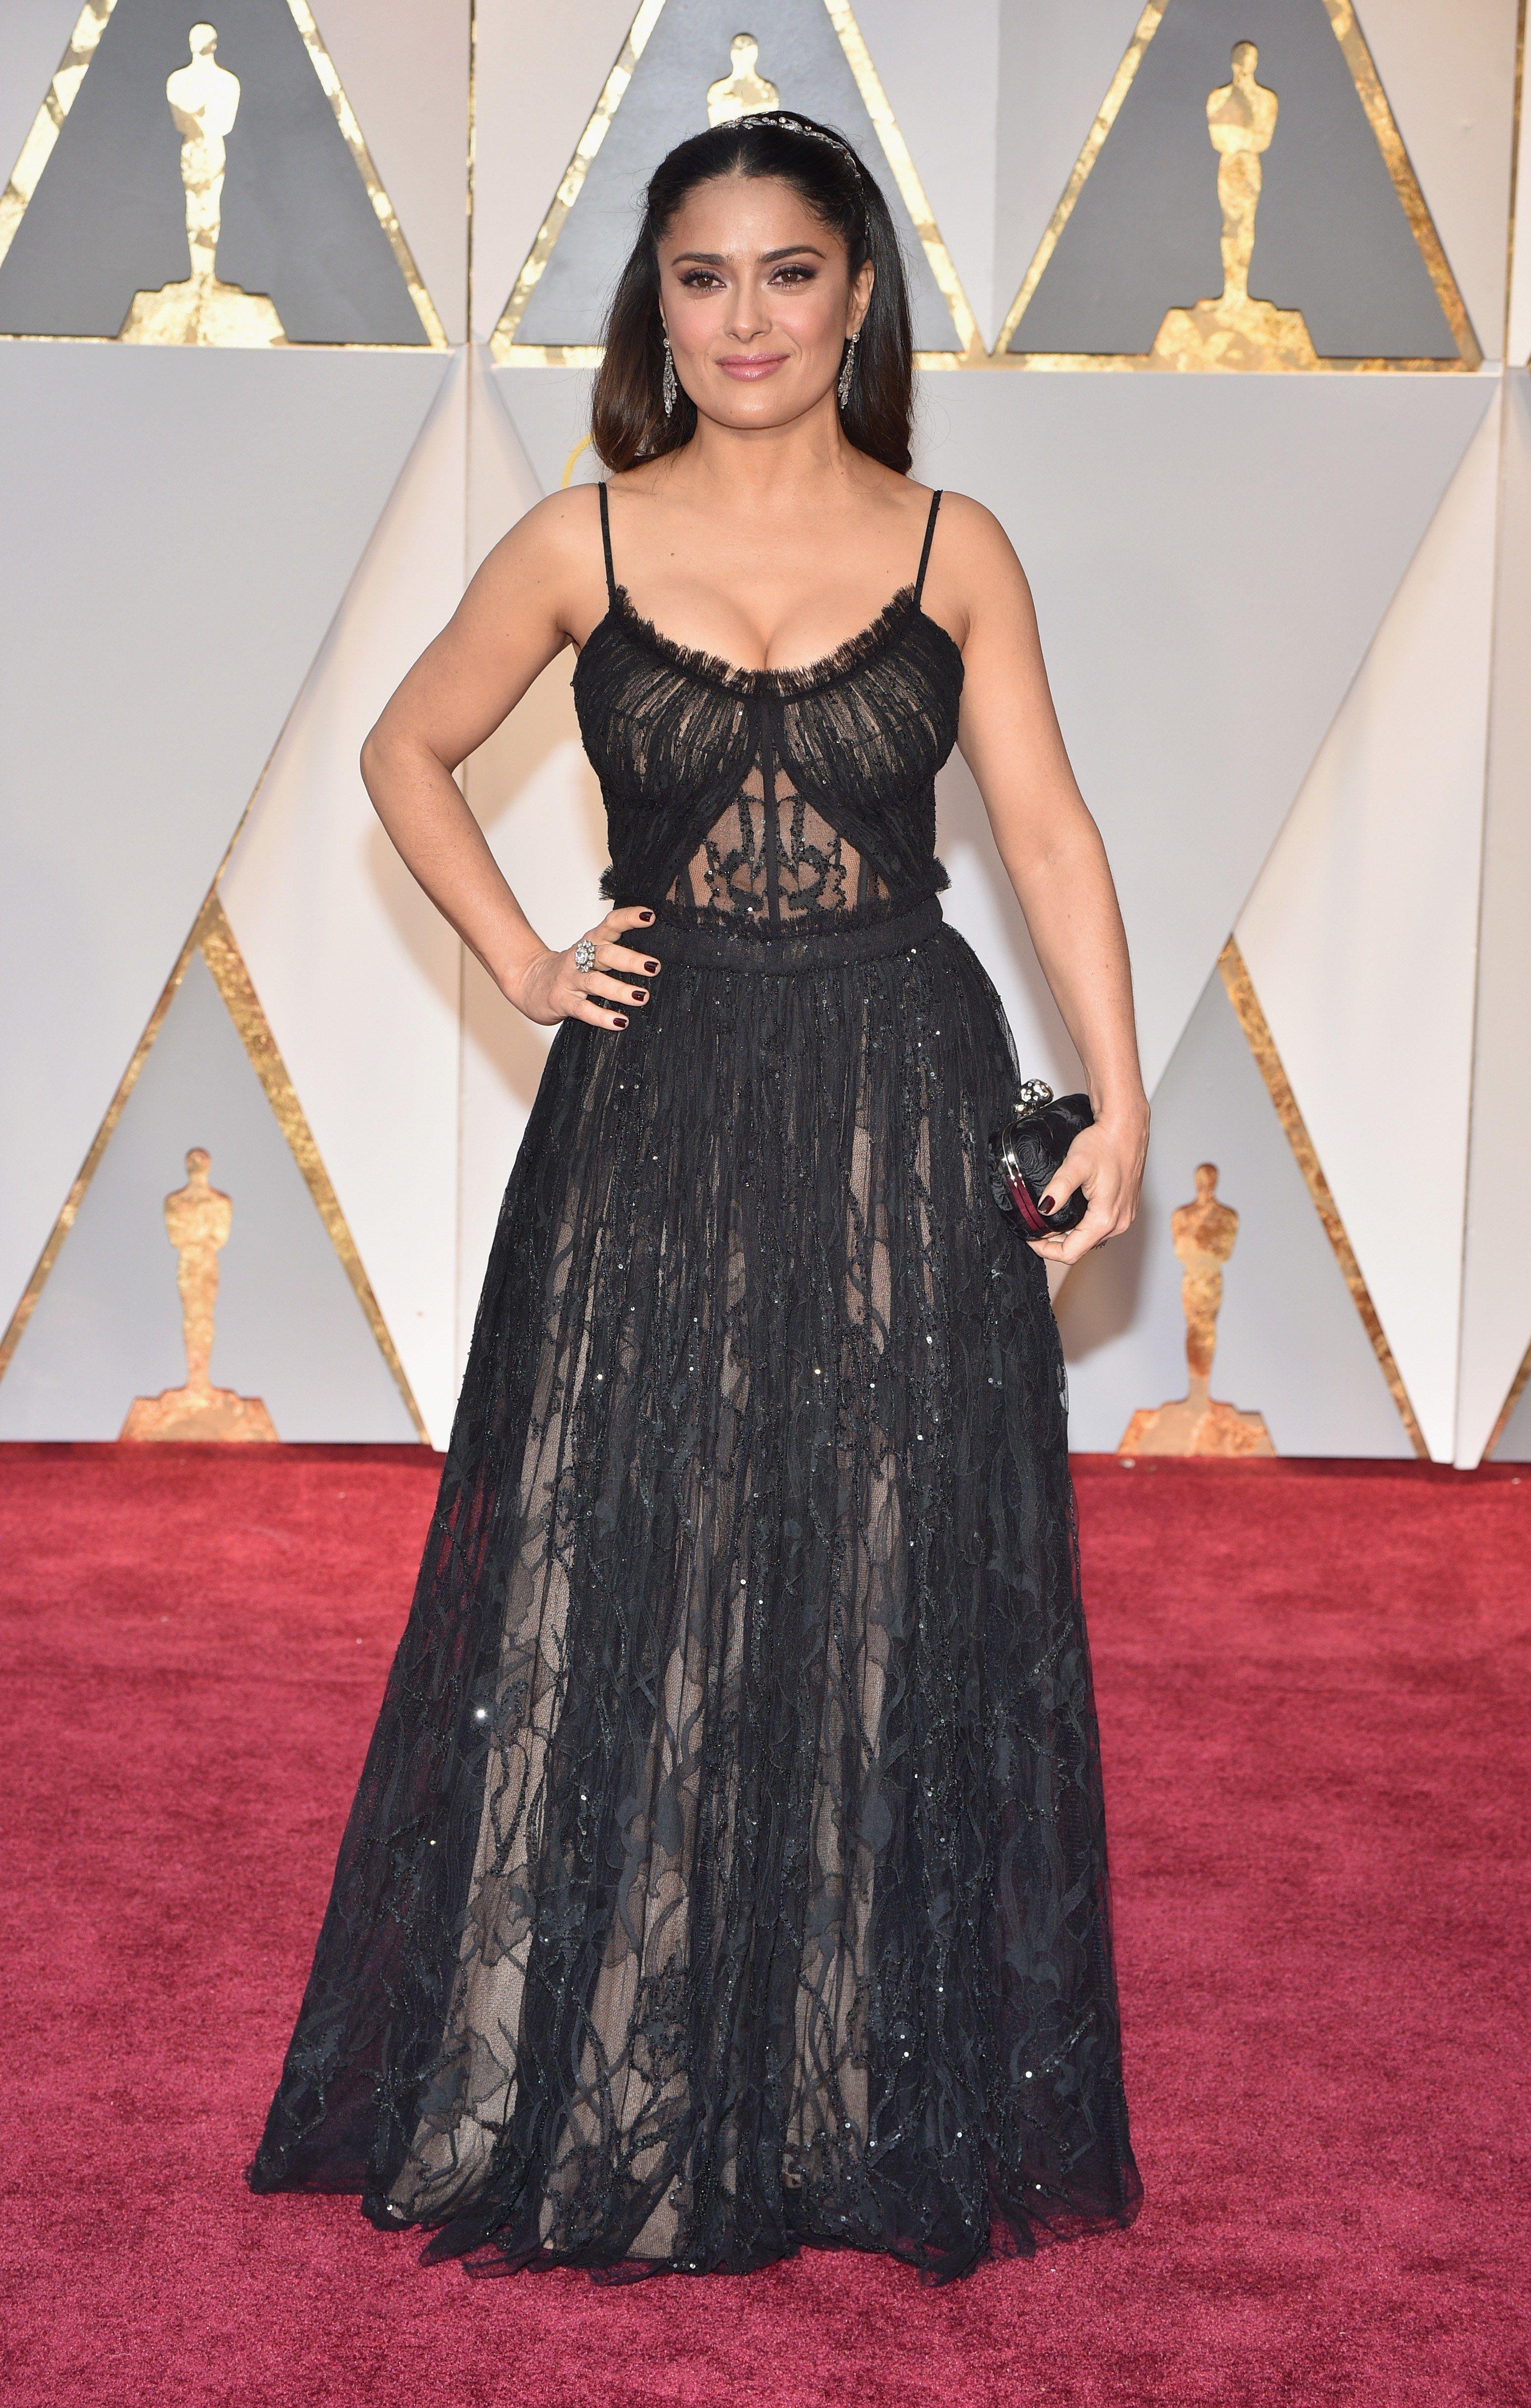 Oscars 2017 Fashion Live From The Red Carpet Oscars Red Carpet Dresses Red Carpet Dresses 2017 Red Carpet Oscars